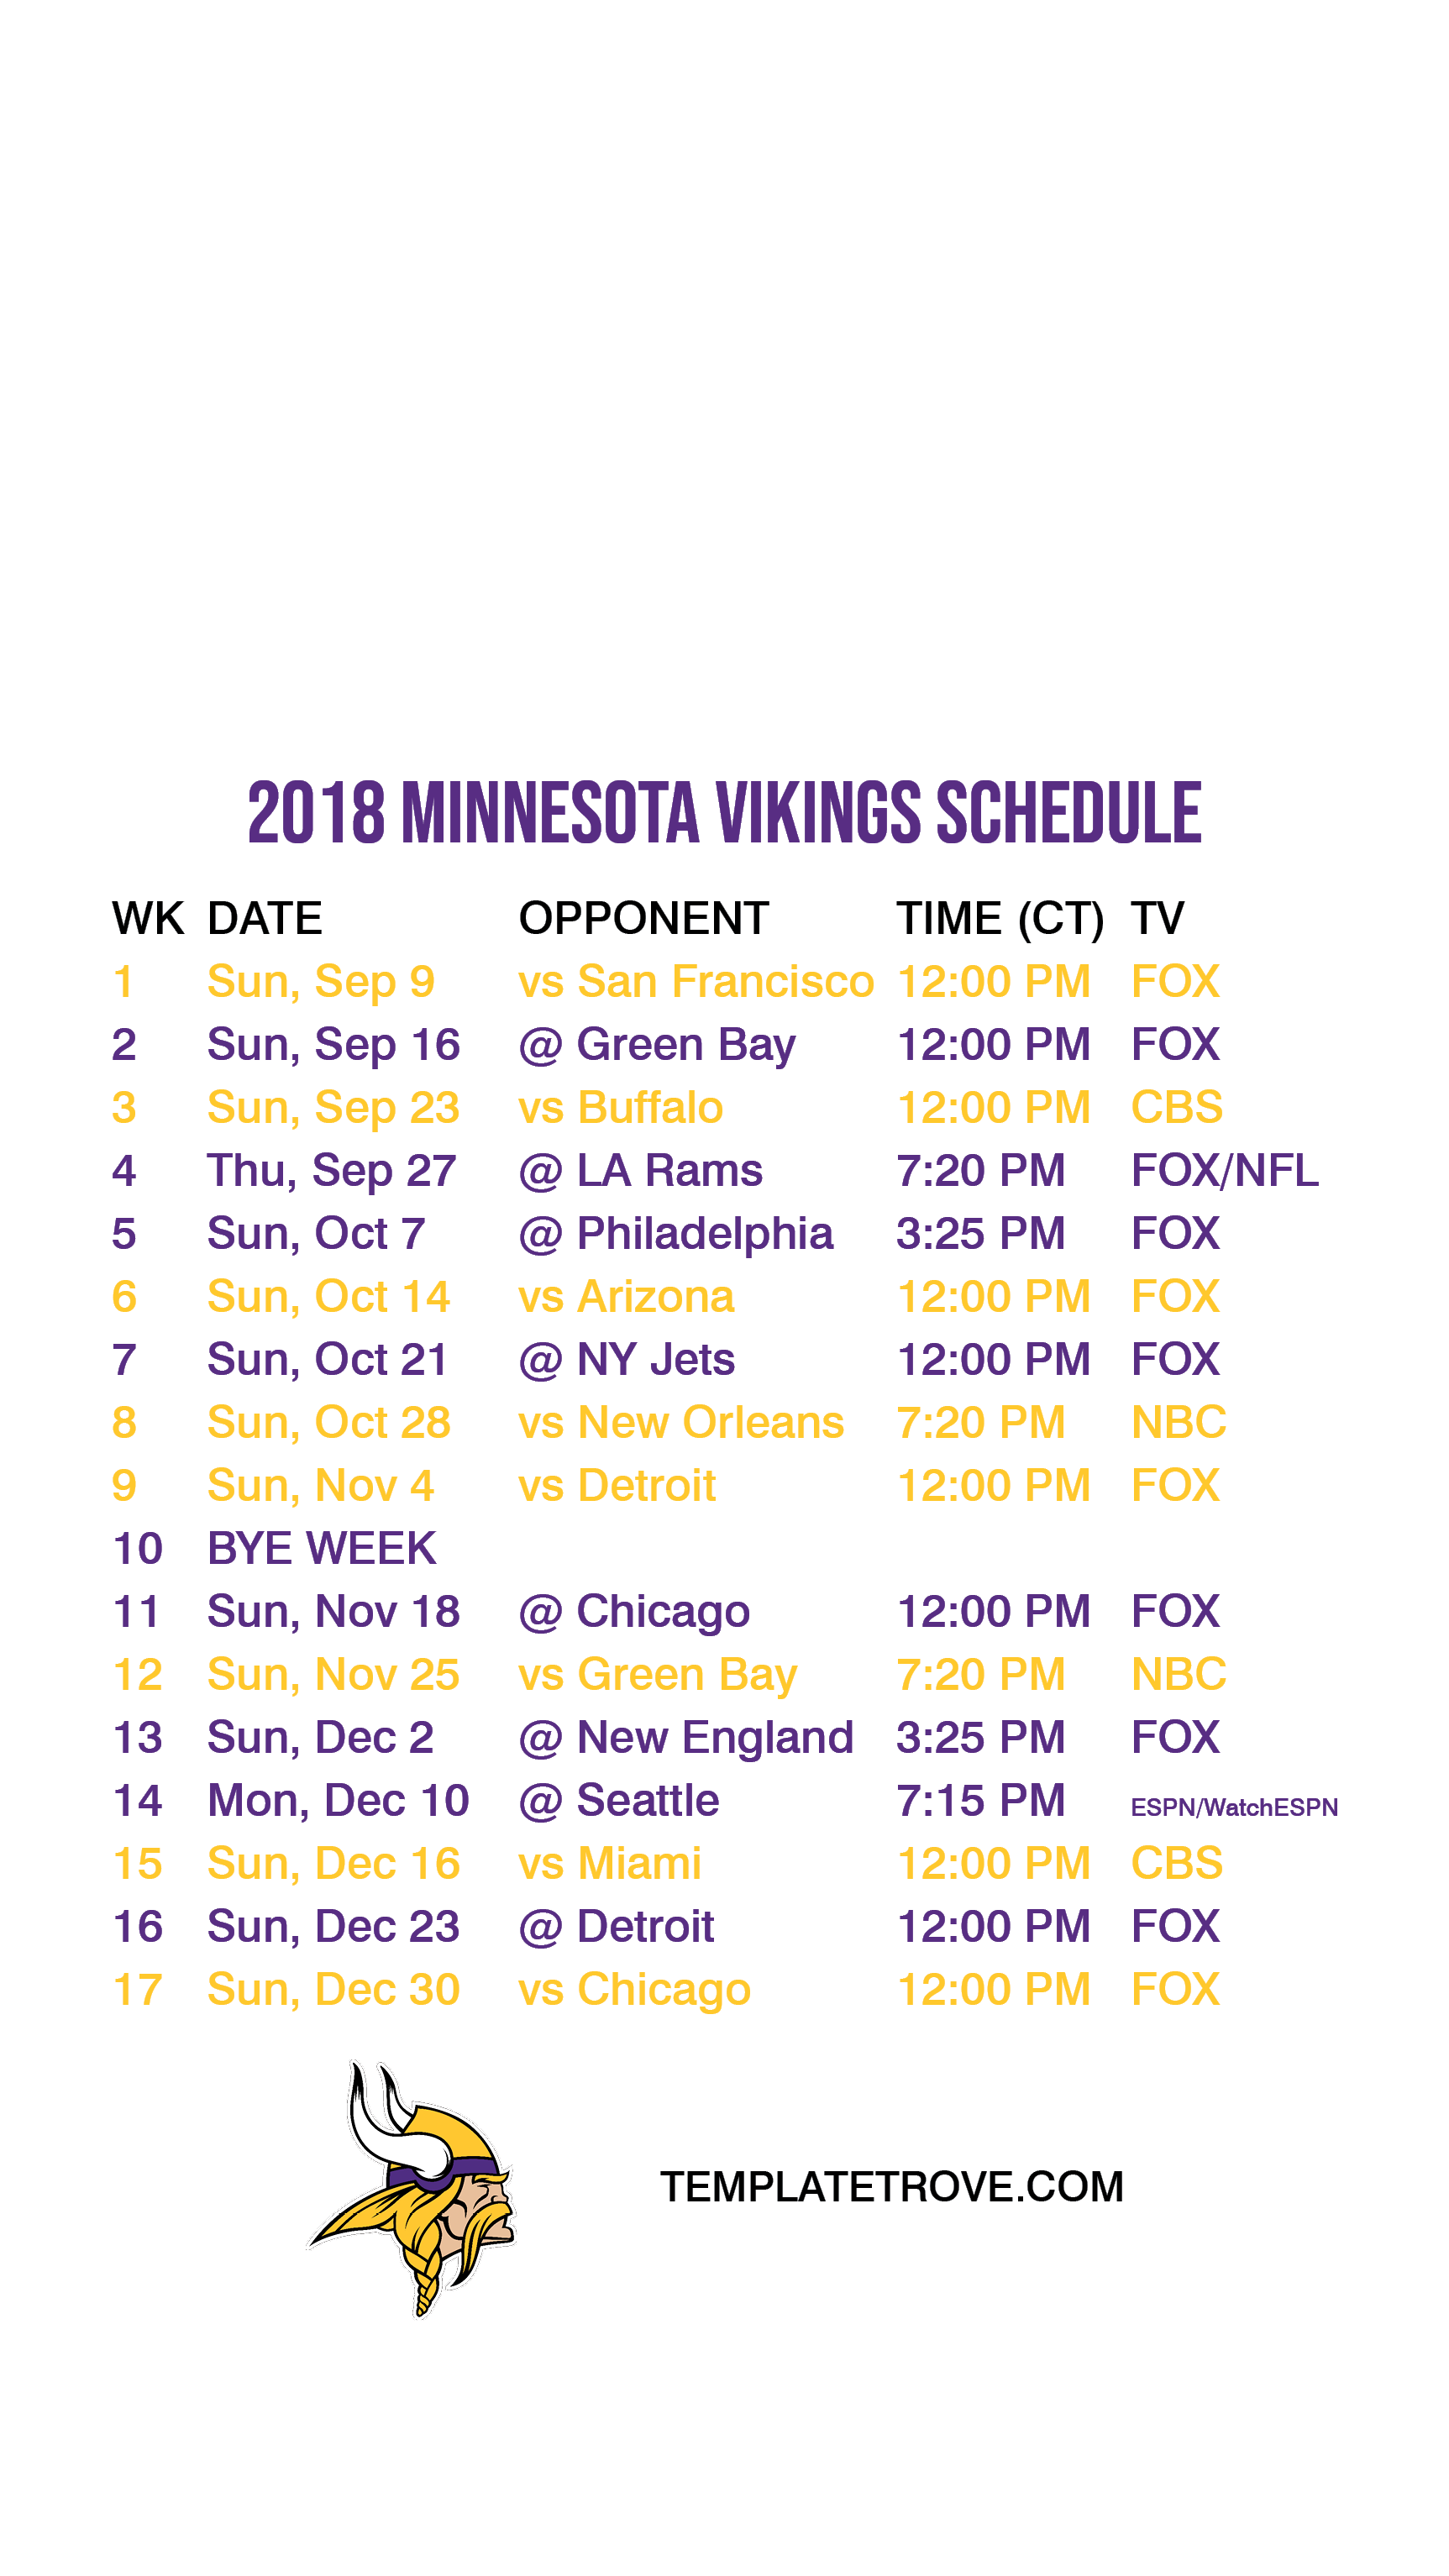 2018 2019 Minnesota Vikings Lock Screen Schedule for iPhone 6 7 8 Plus 1725x3067